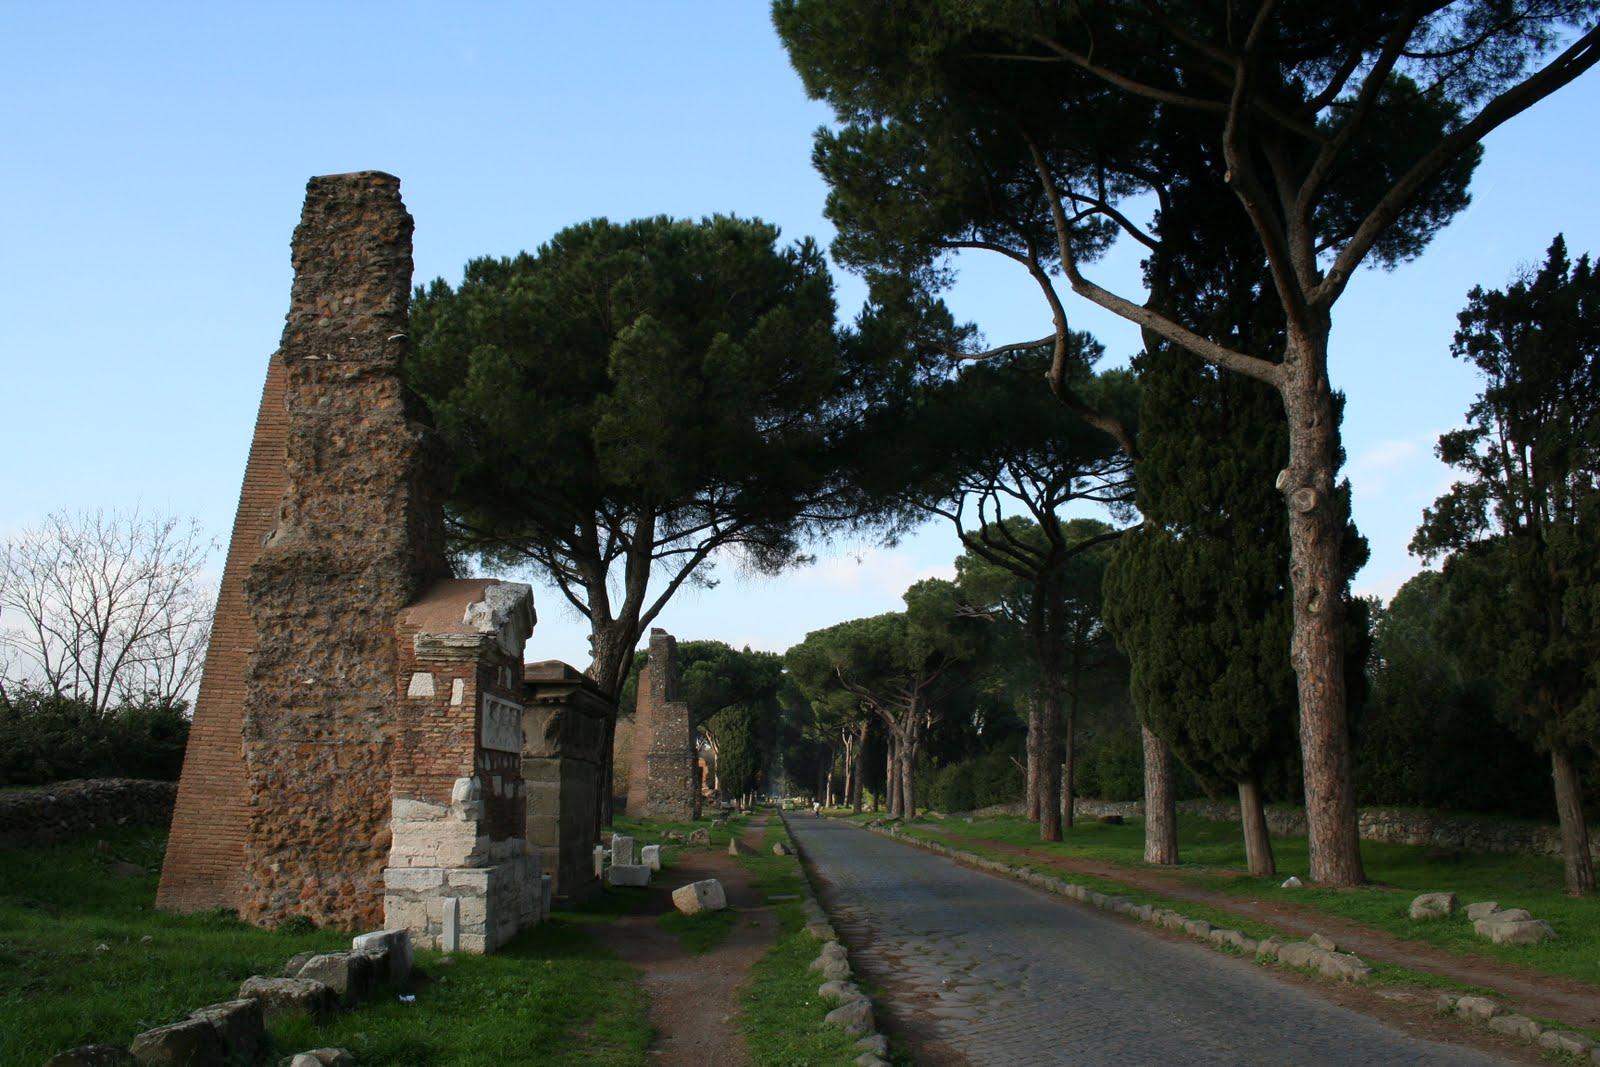 Viajar roma la v a appia antica y las catacumbas for Cioccari arredamenti via appia